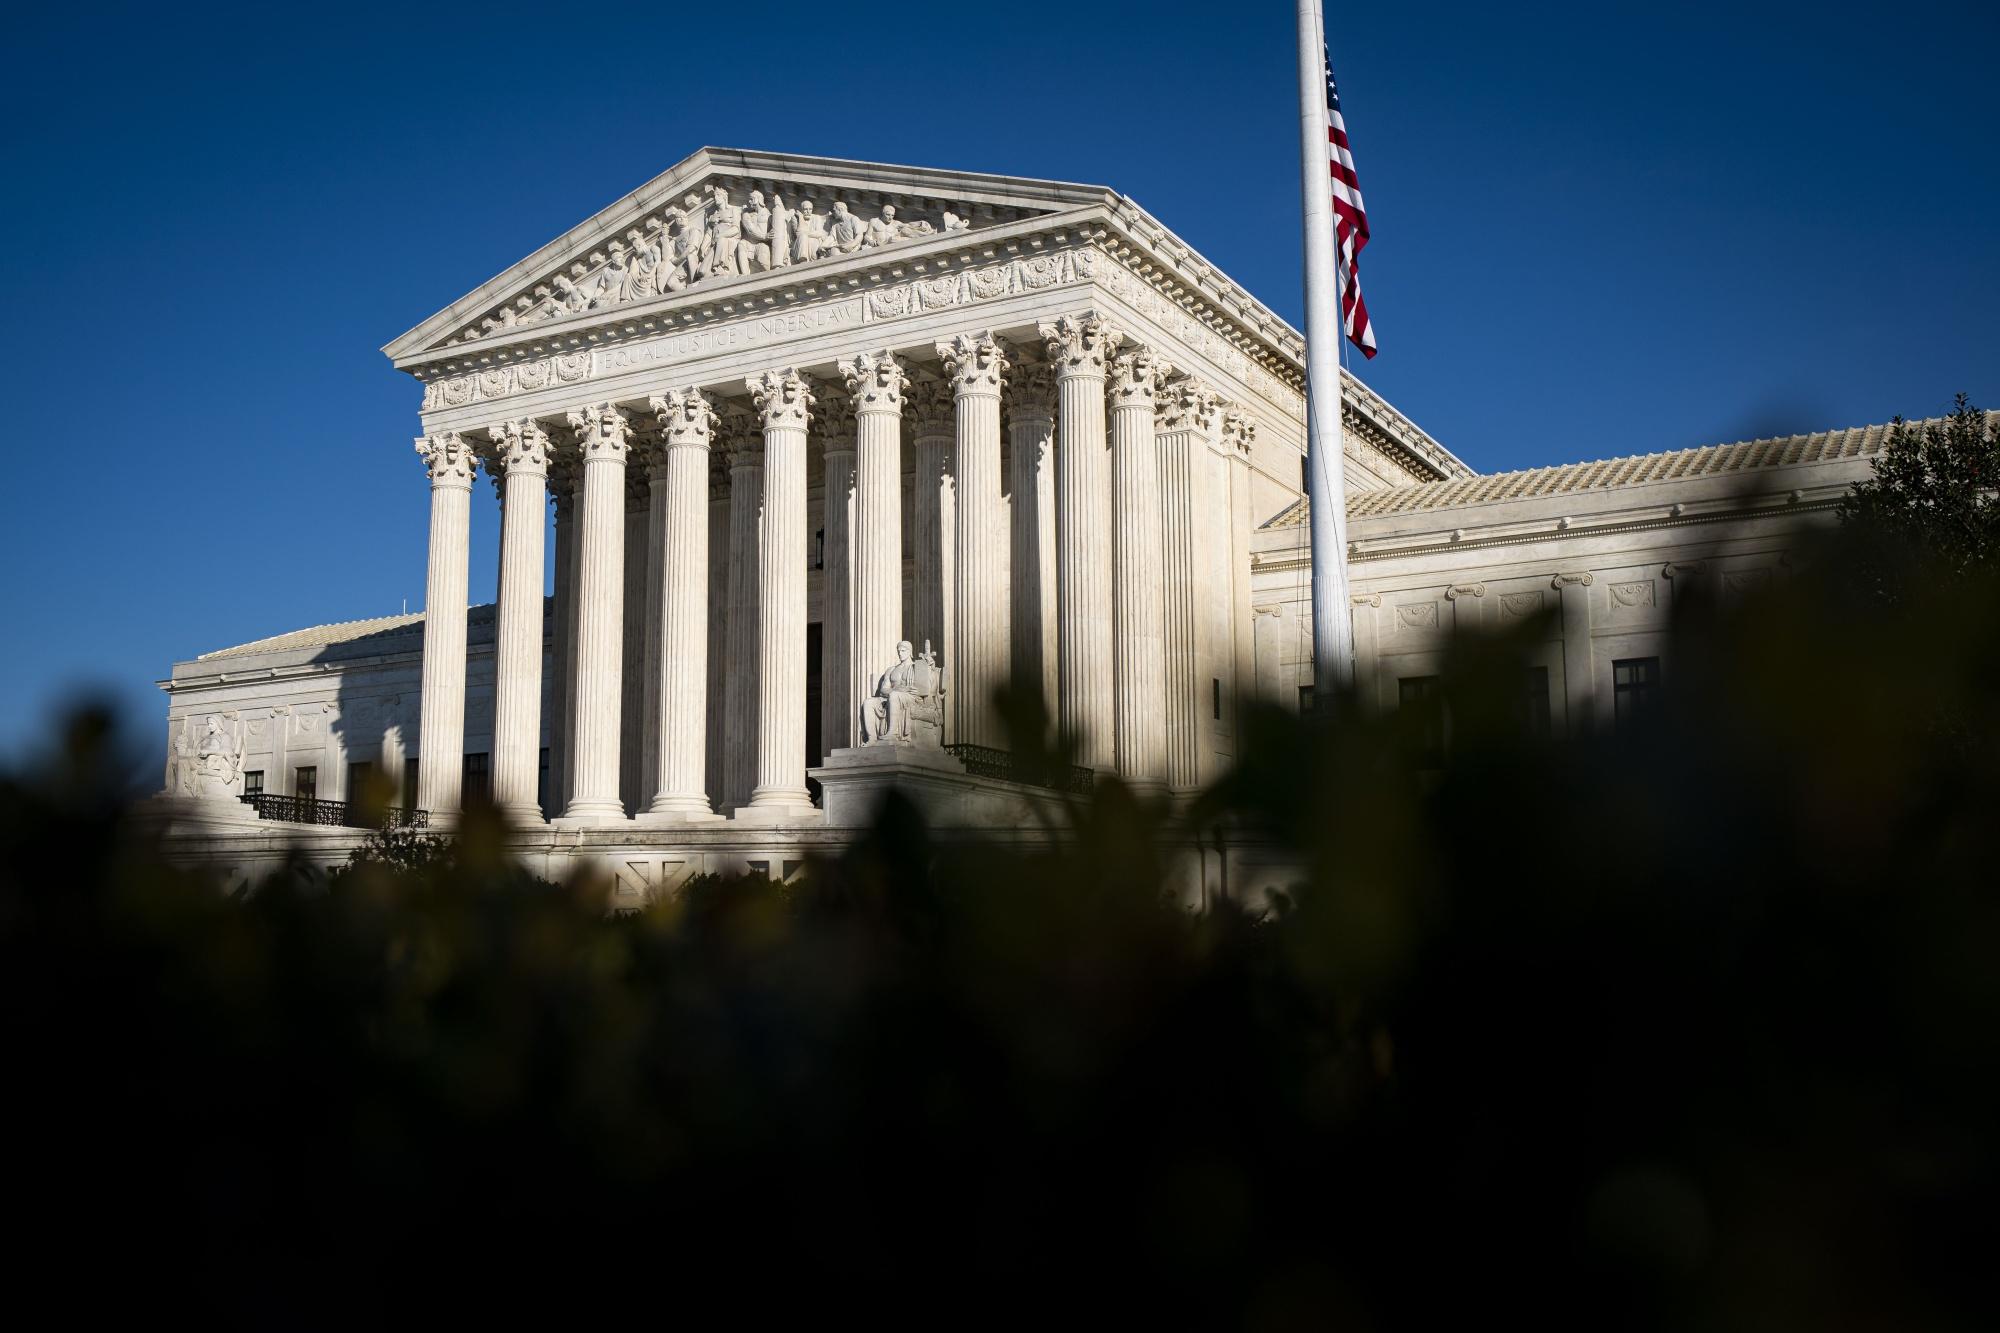 The U.S. Supreme Court in Washington, D.C., U.S., onDec. 7.